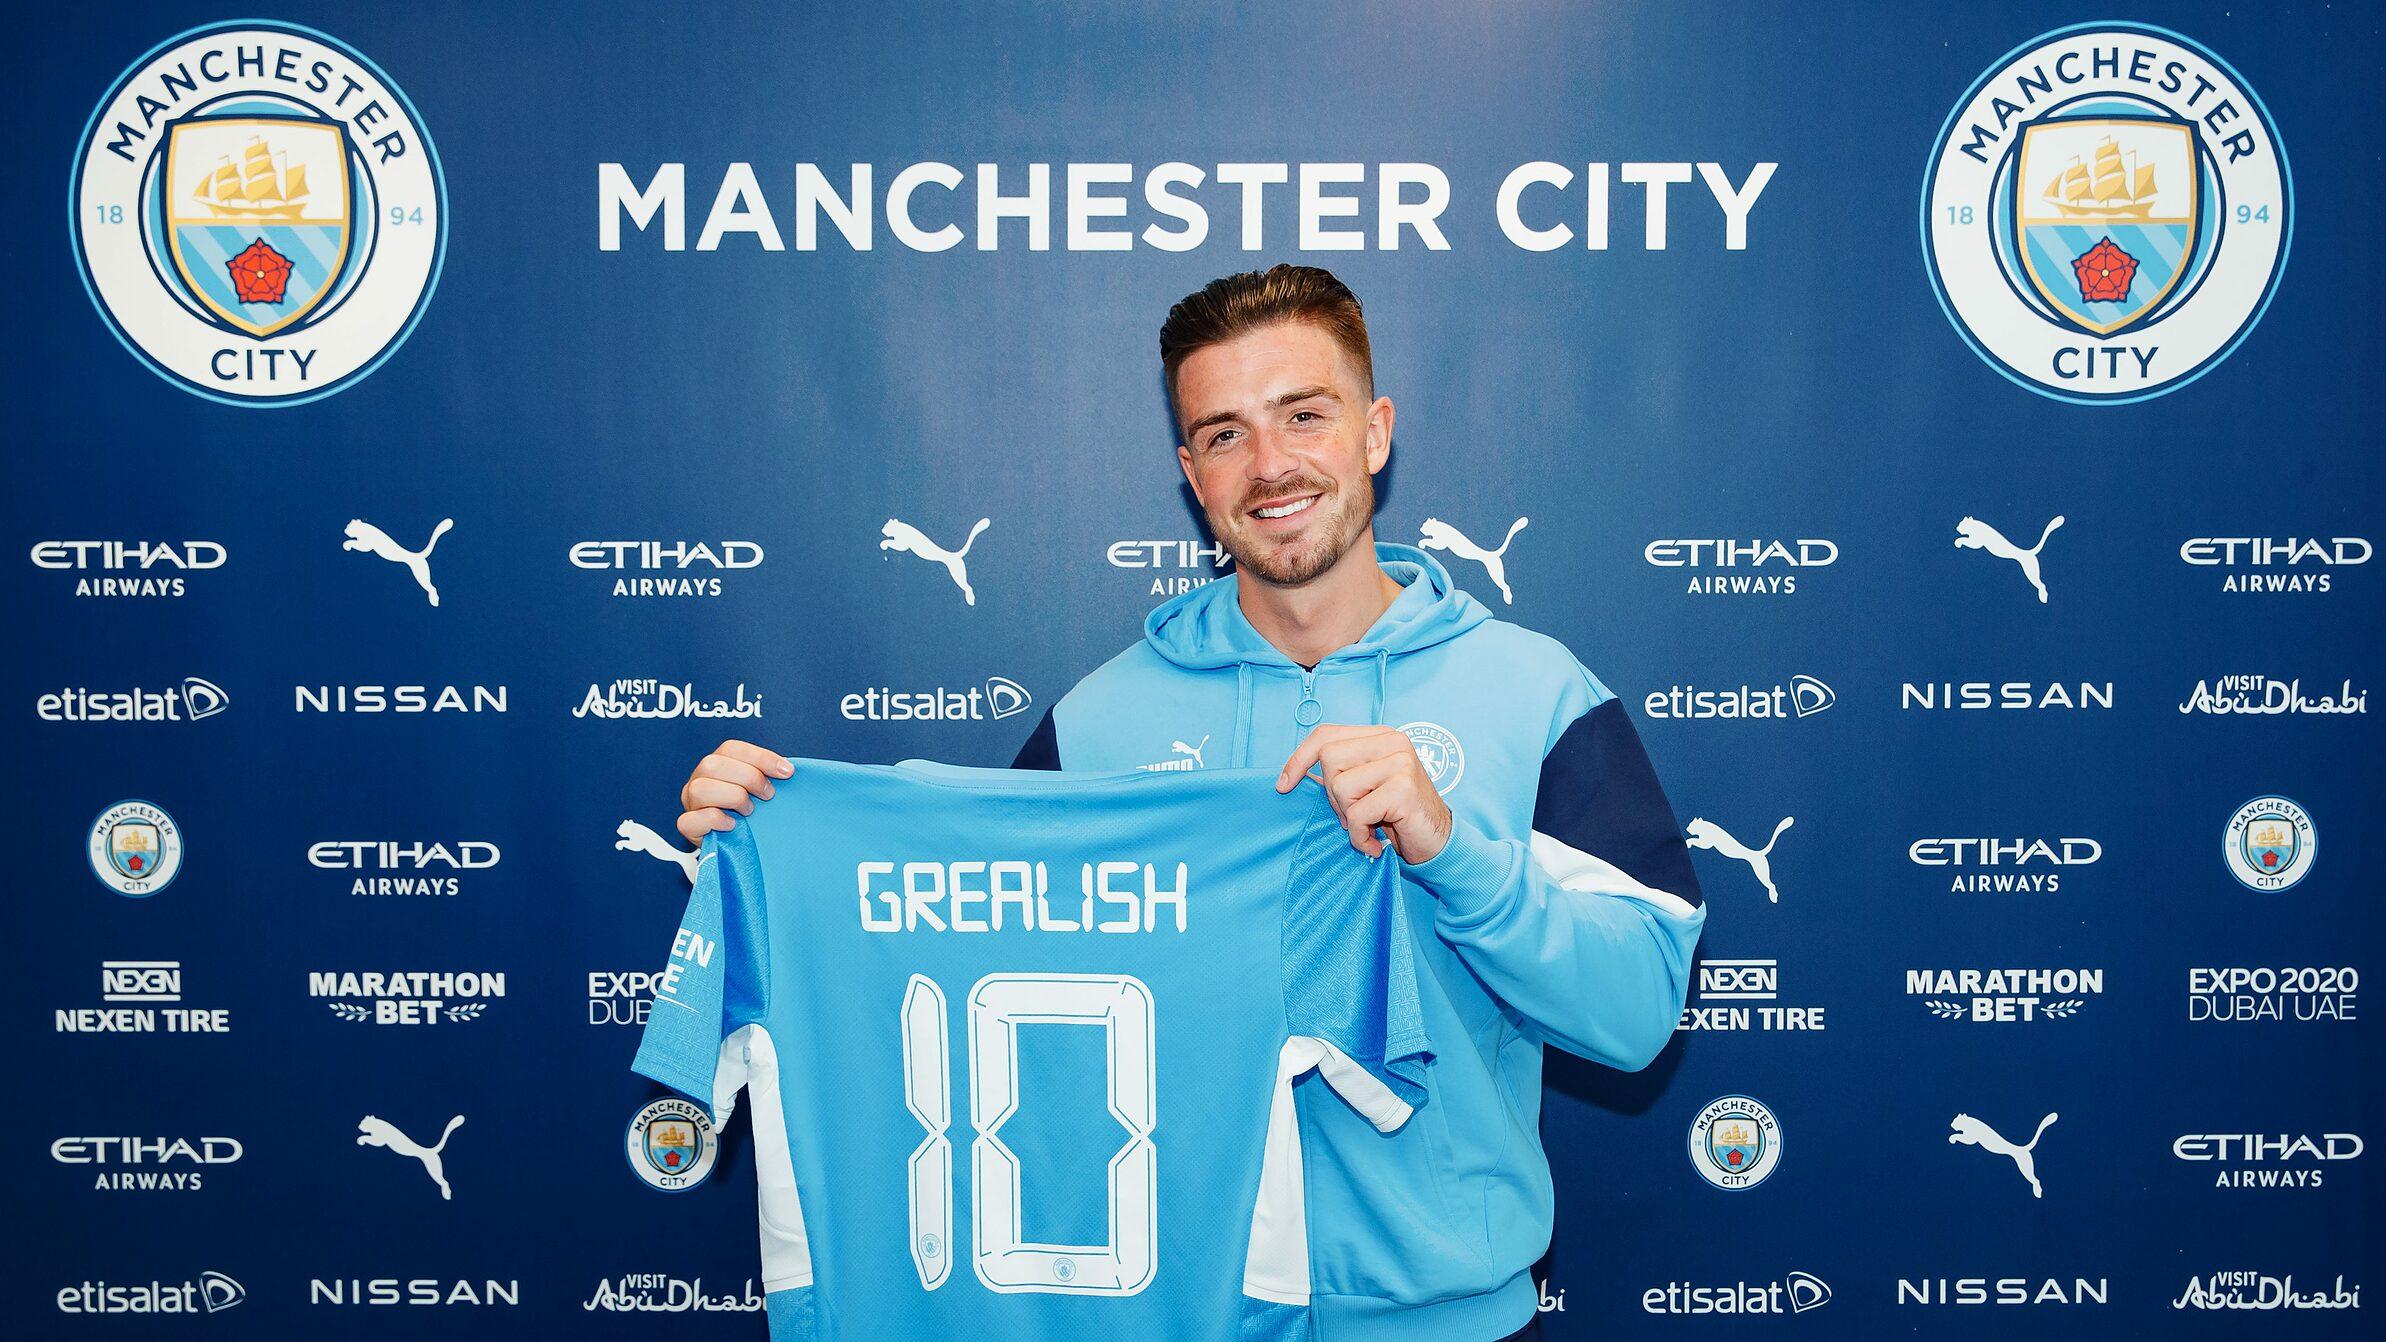 Jack Grealish เข้าร่วม Man City ในข้อตกลง 100 ล้านปอนด์  ภาพถ่าย: Twitter